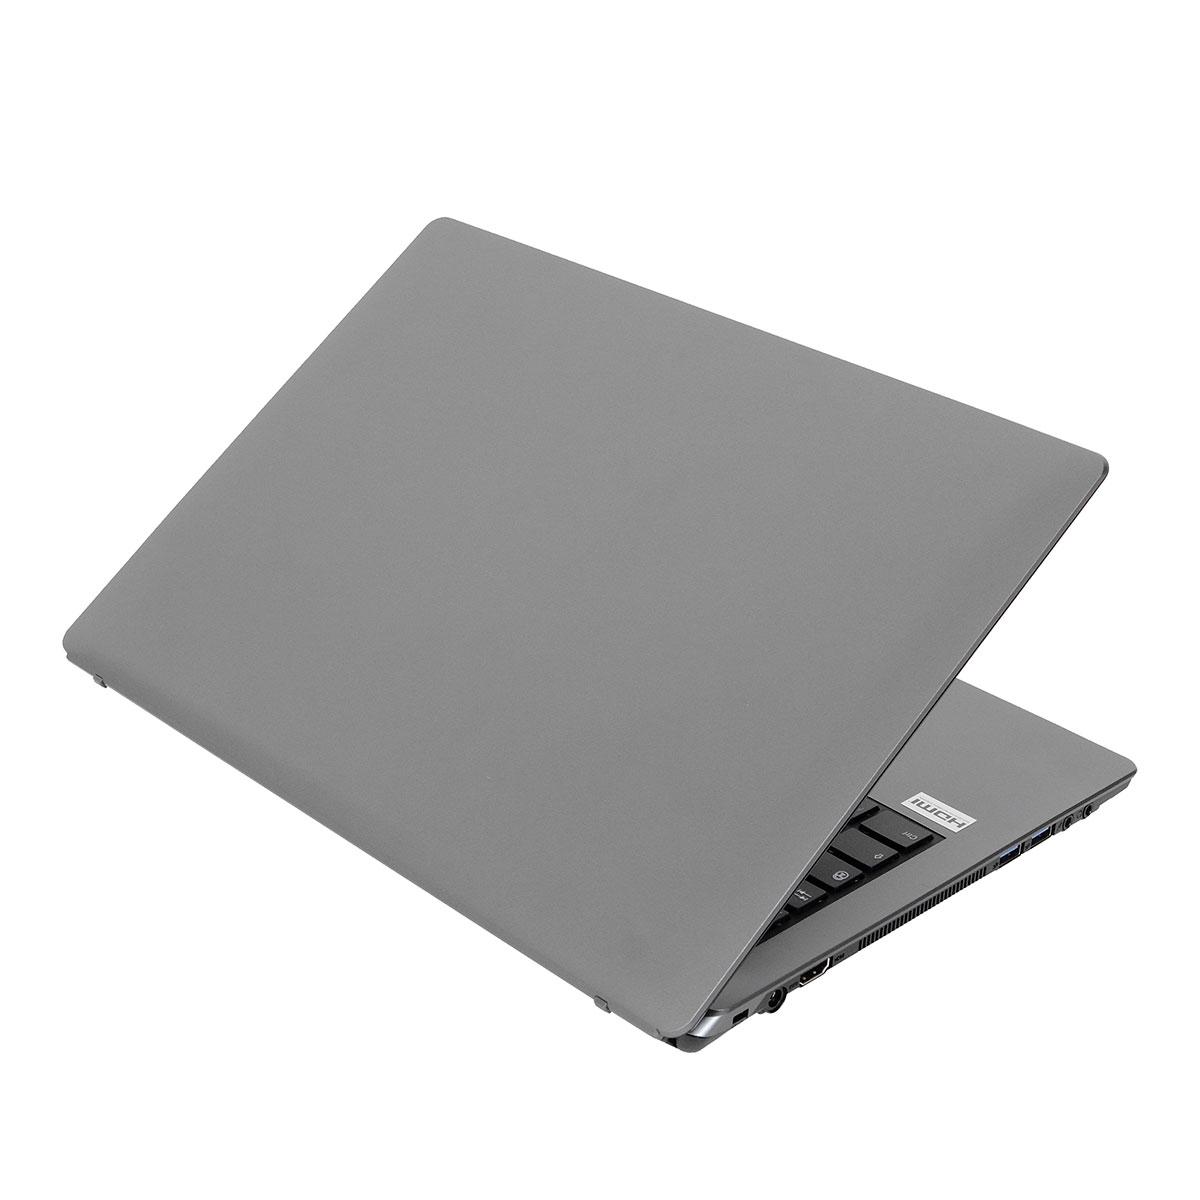 "PC portable LDLC Aurore PC3-4-S2 Intel Celeron N3160 4 Go SSD M.2 240 Go 14"" LED HD Wi-Fi N/Bluetooth Webcam (sans OS)"